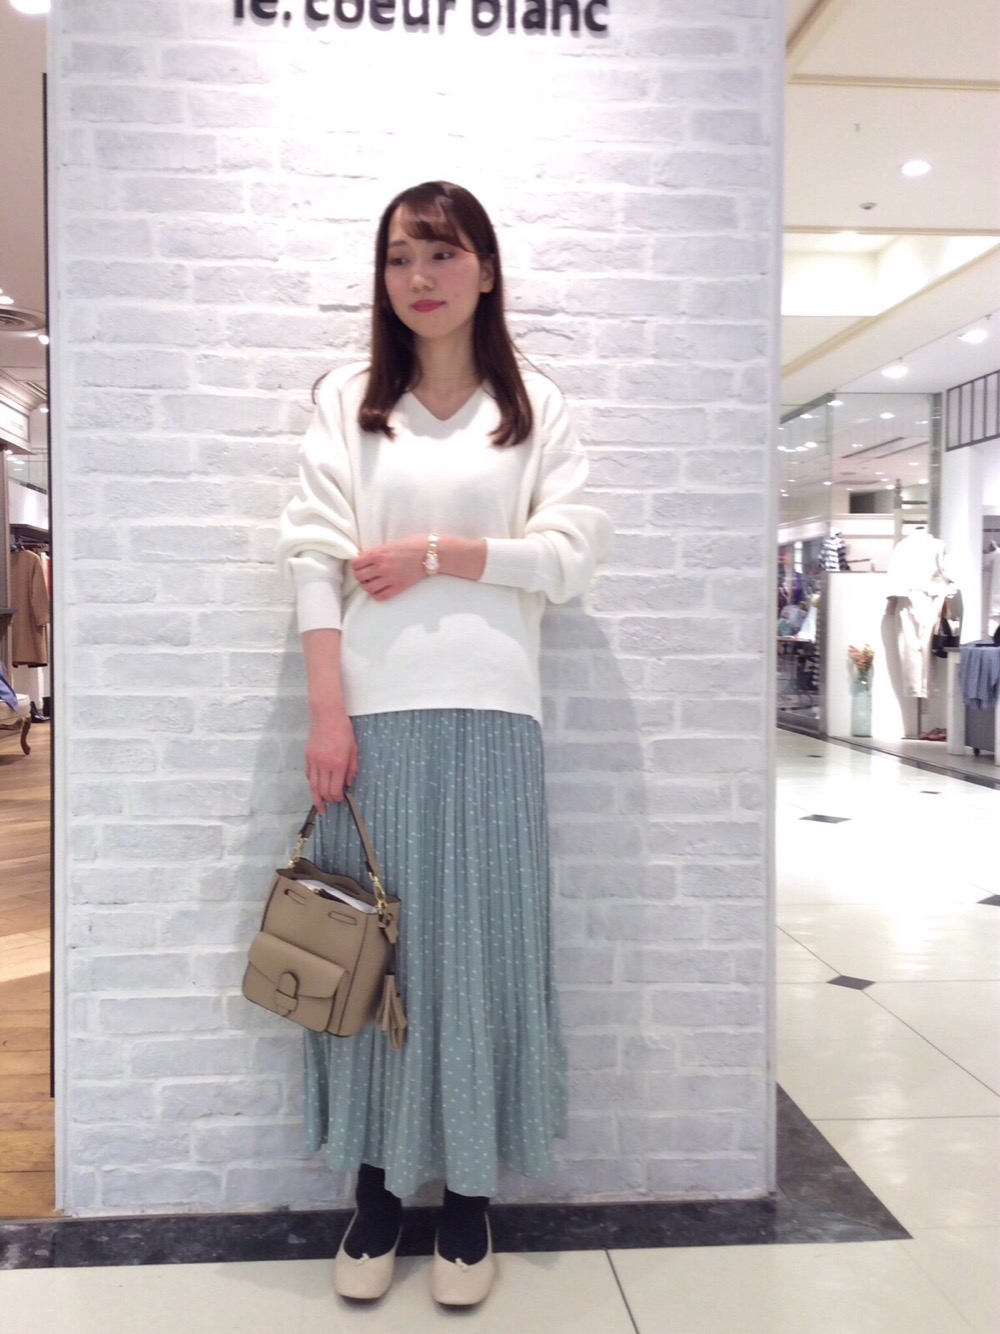 le.coeur blanc大船ルミネ ウィング店